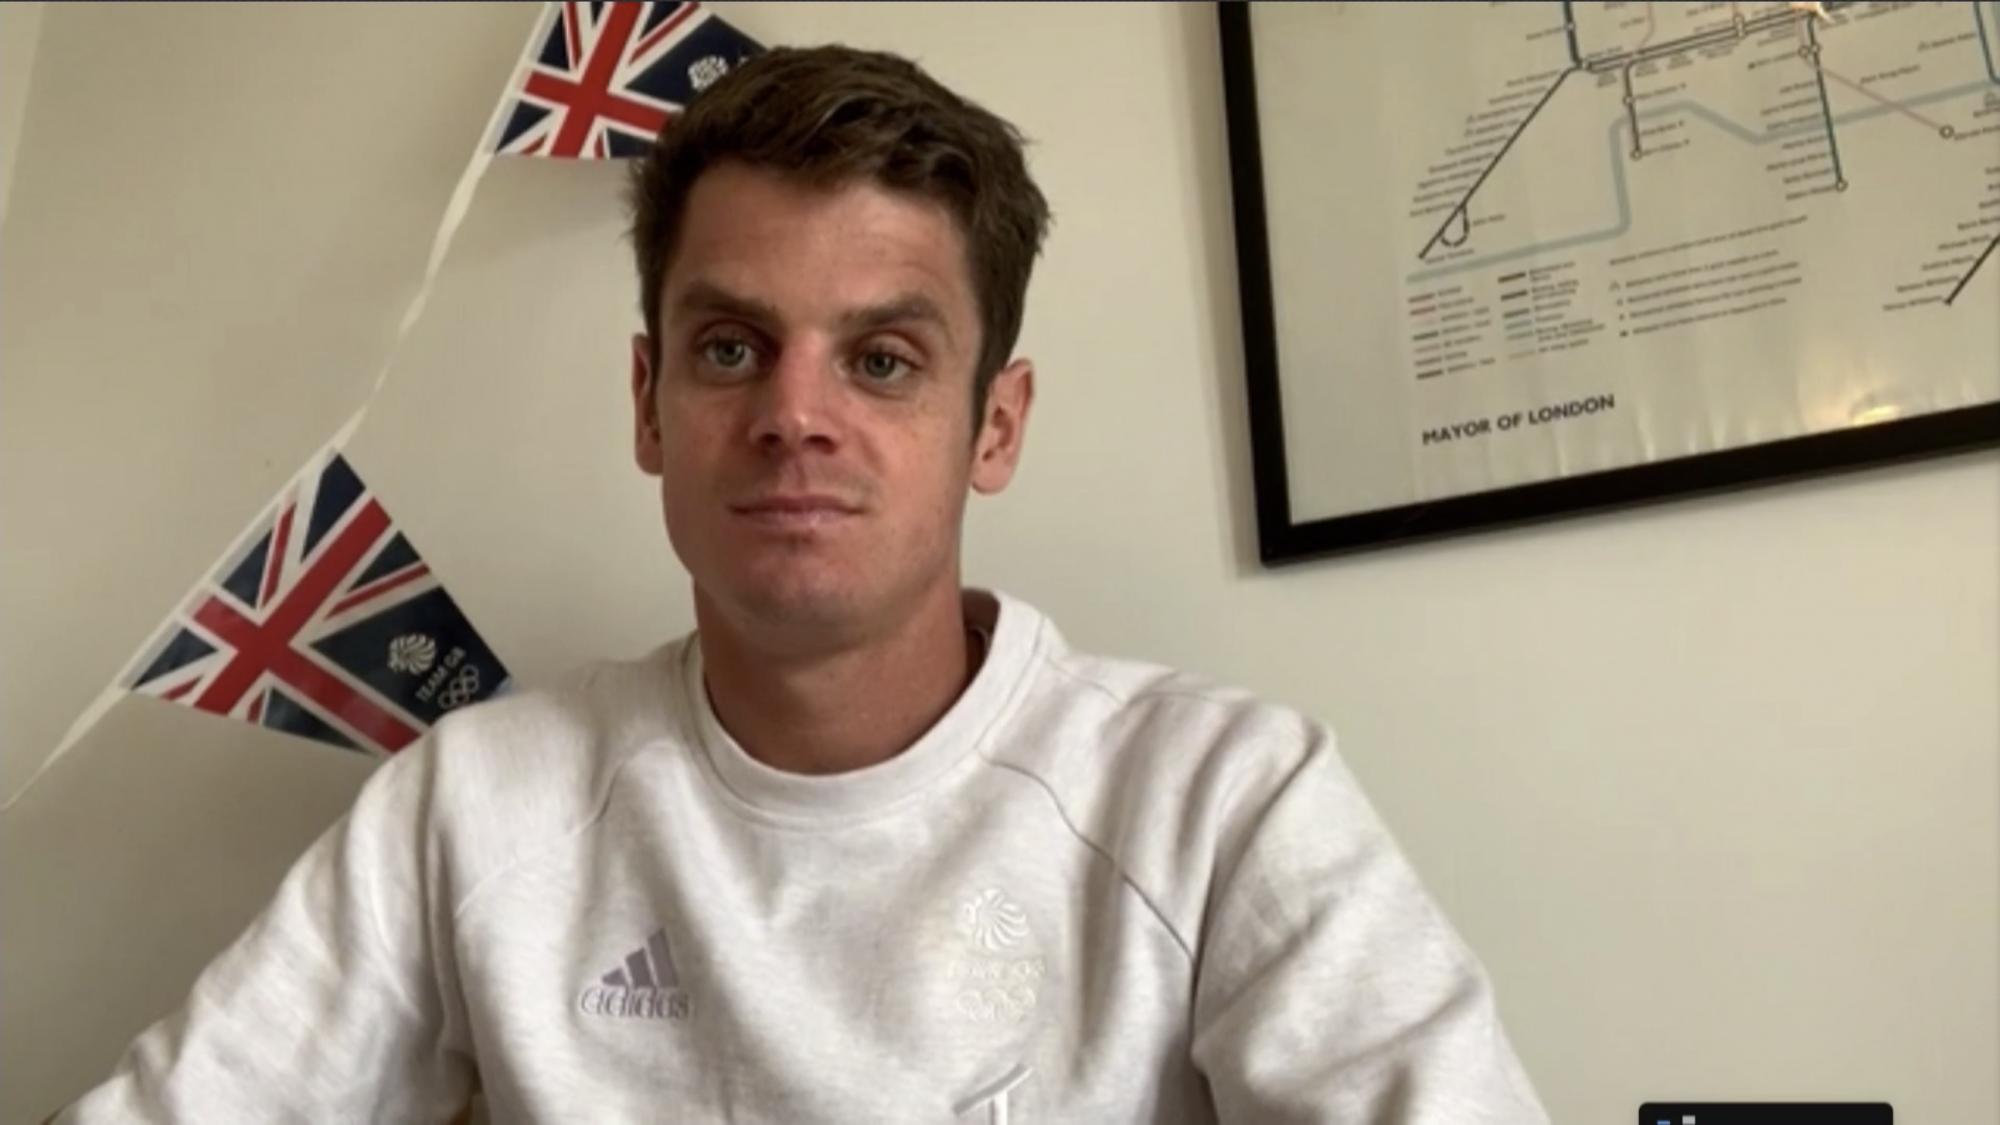 Team GB's Jonny Brownlee reflects on winning gold at 'strange' Tokyo Olympics - channel 4